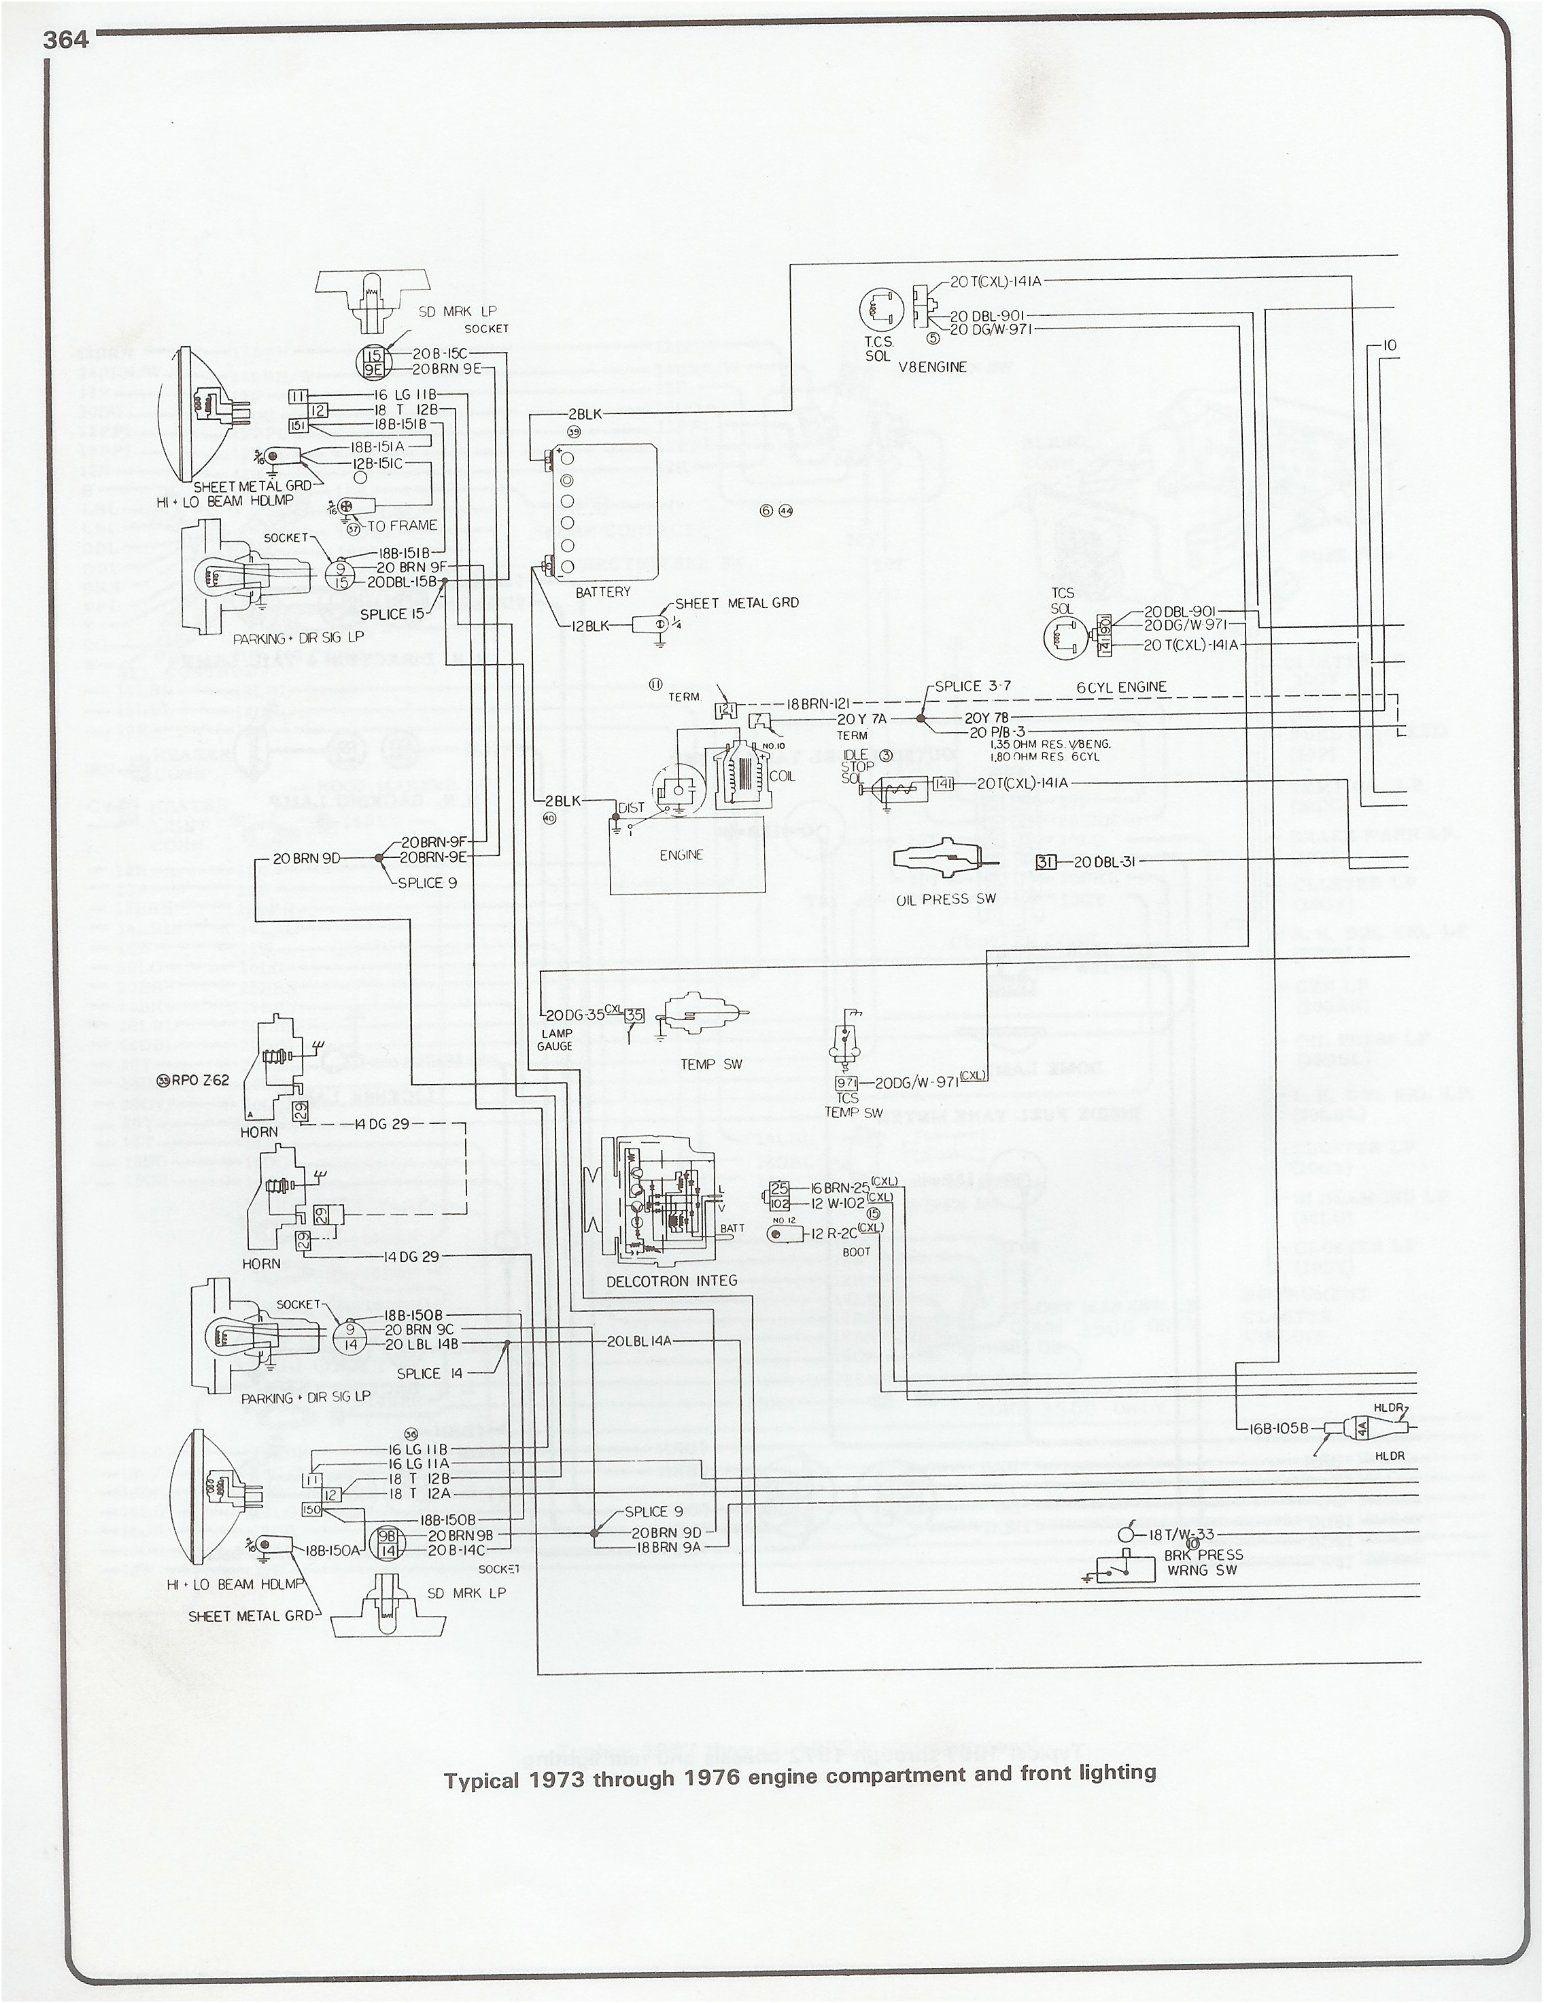 64 chevy pickup wiring diagram